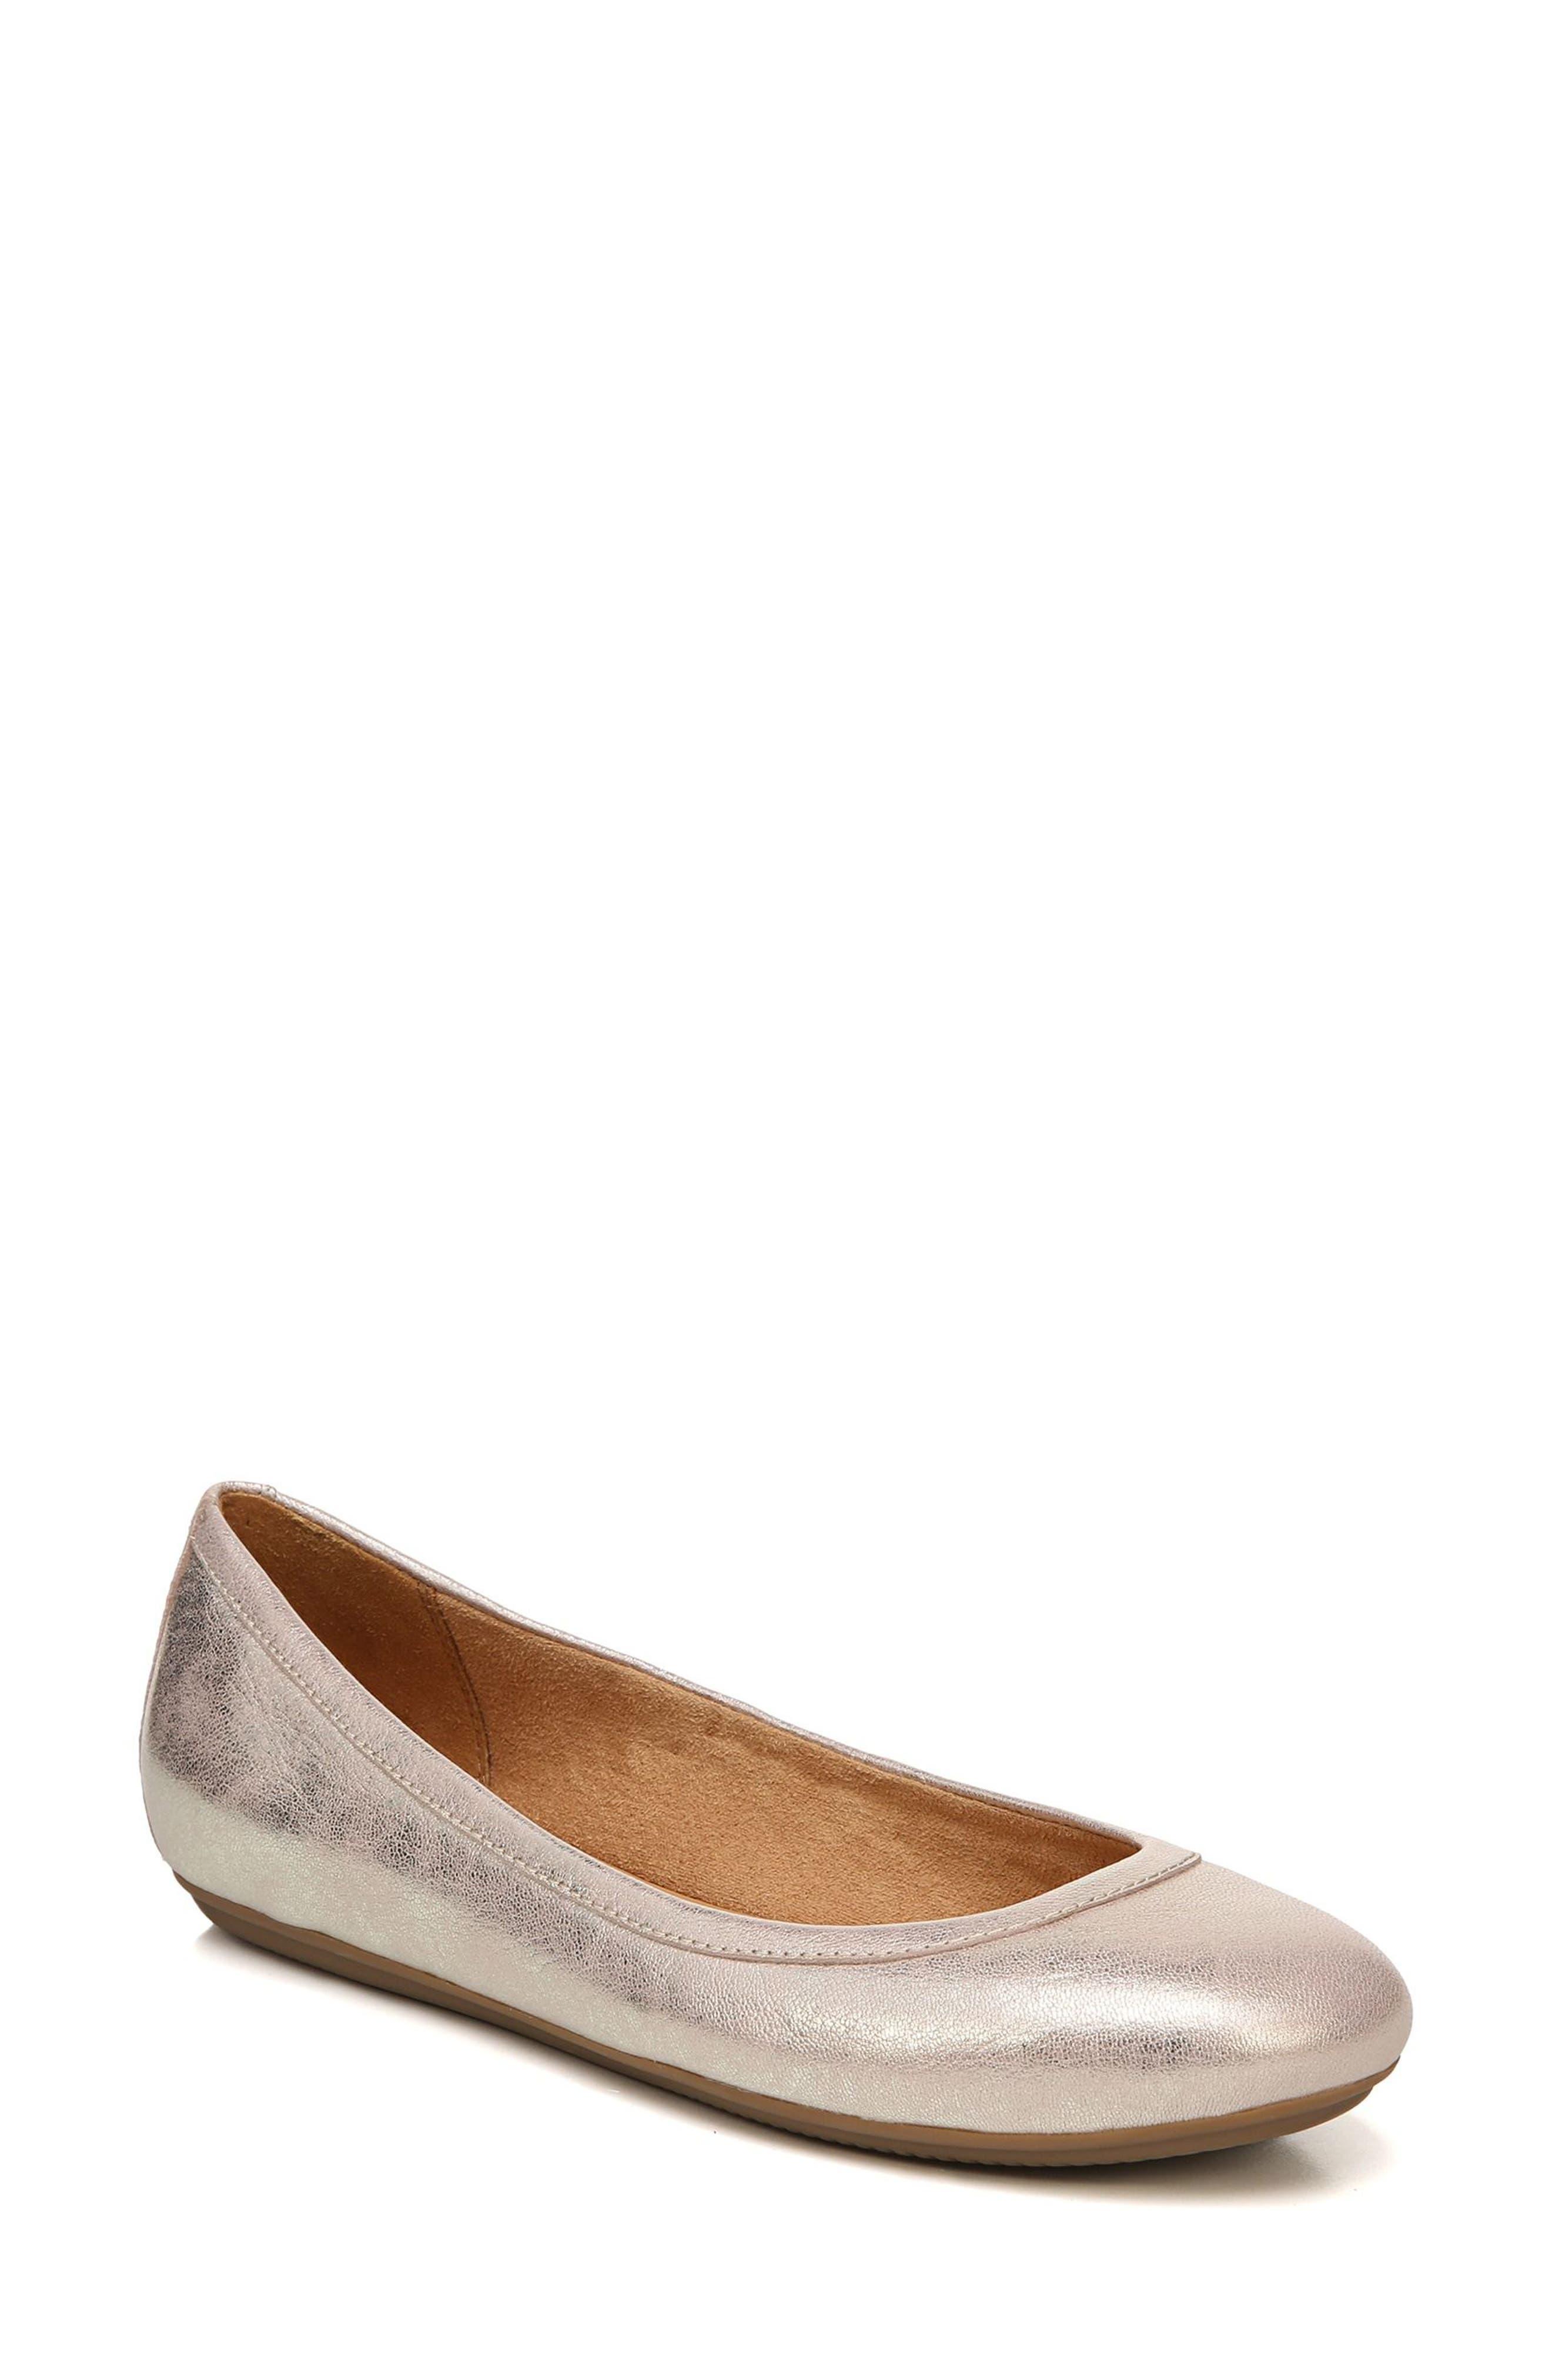 Brittany Ballet Flat,                             Main thumbnail 1, color,